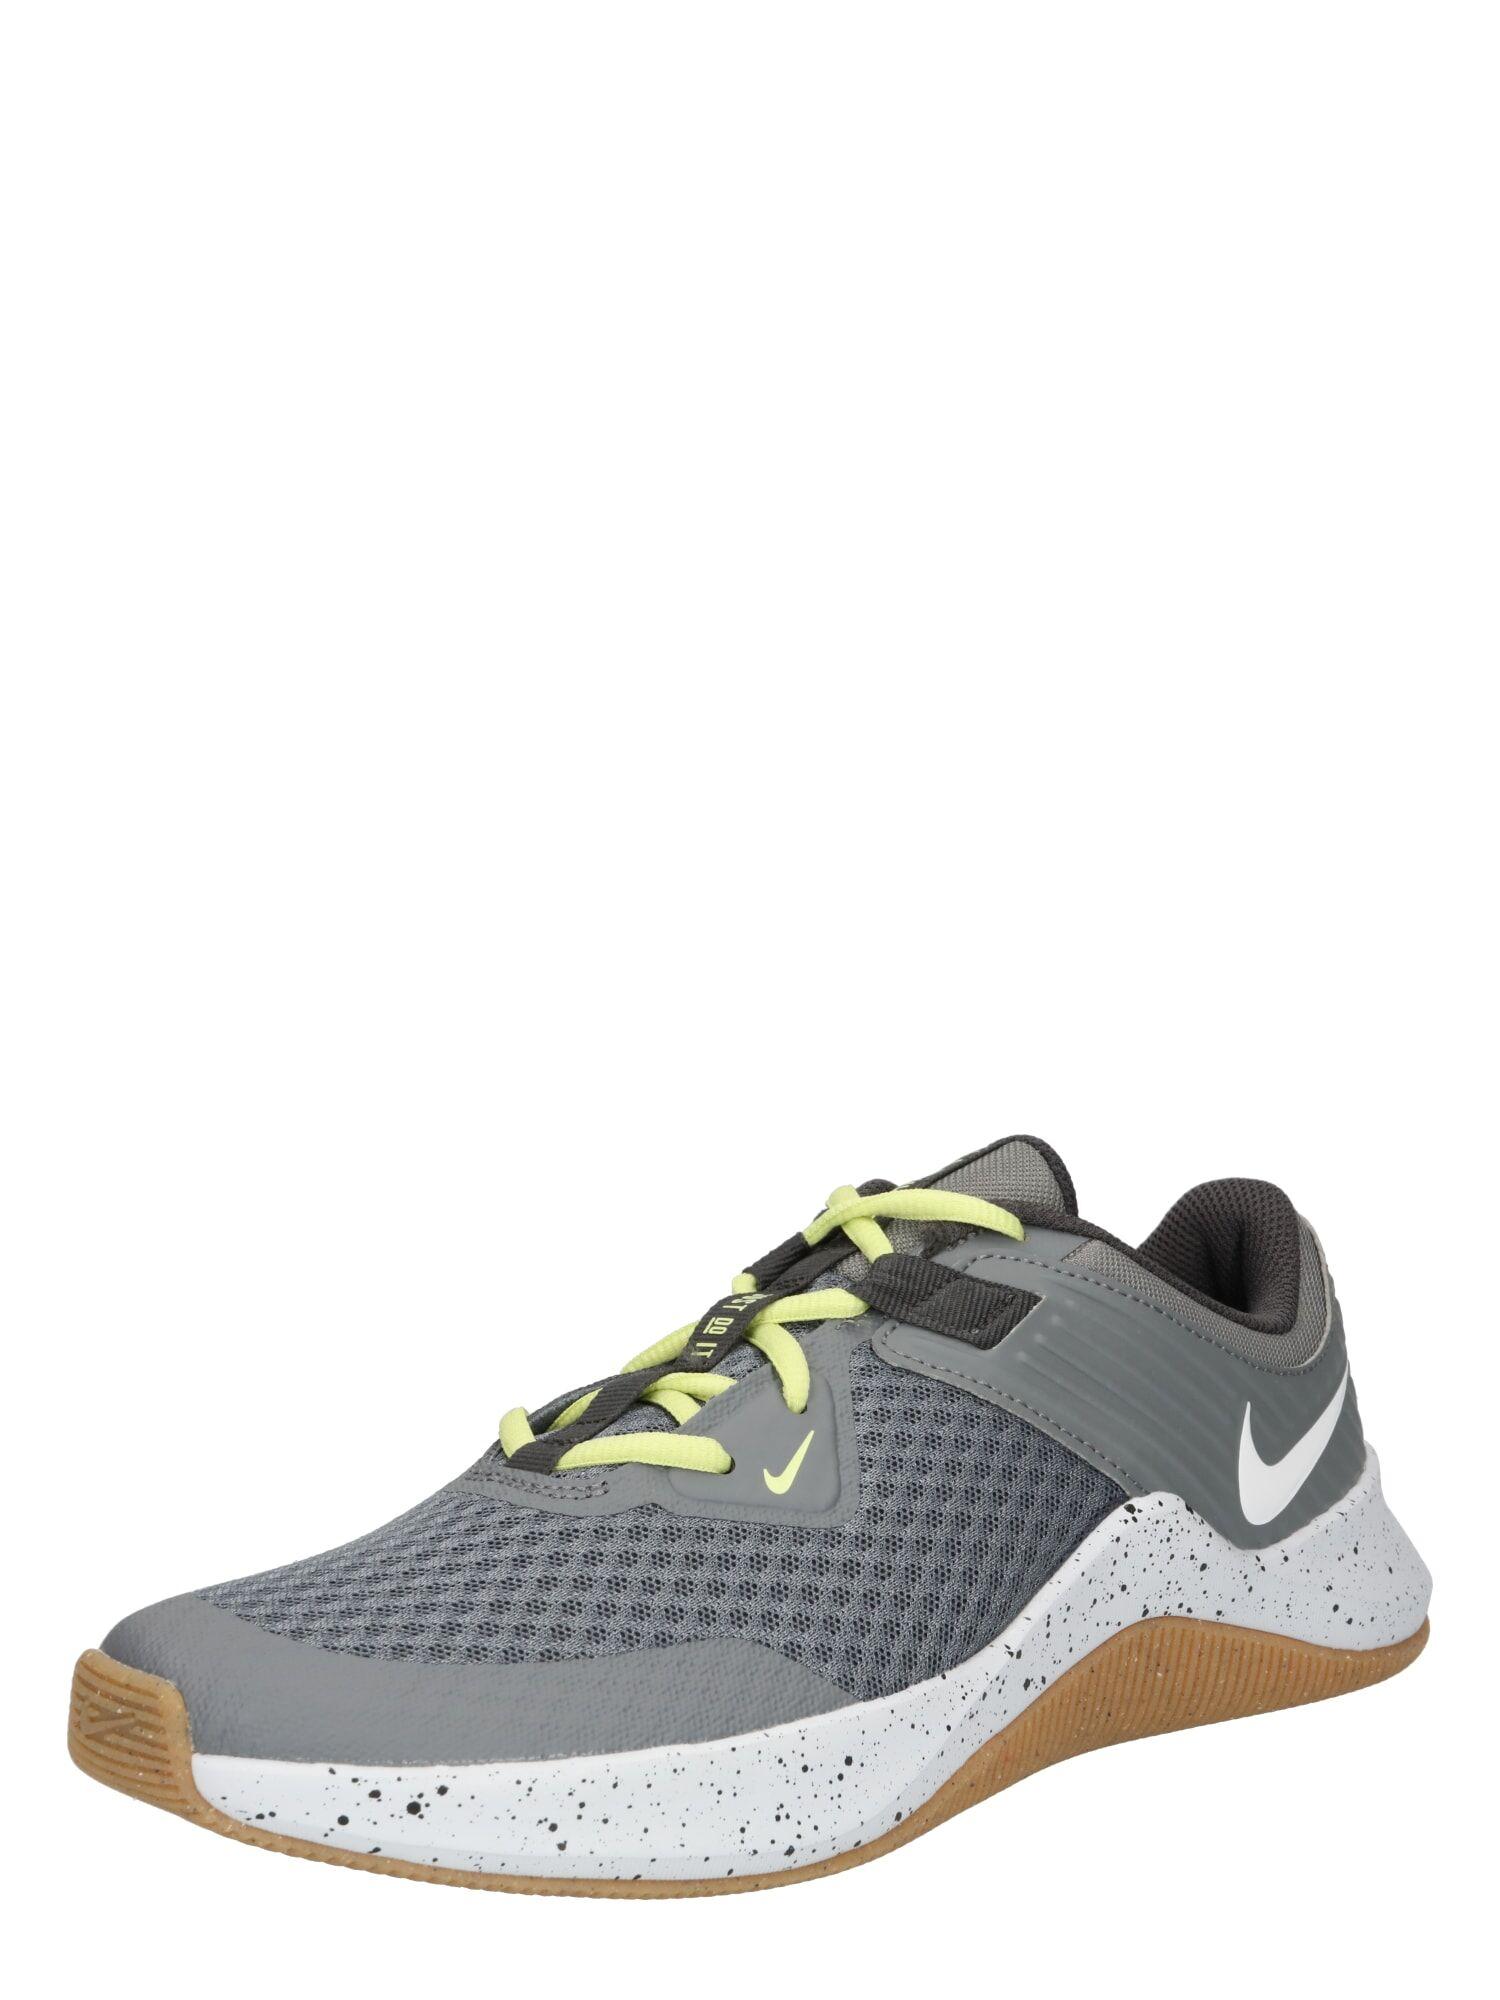 NIKE Chaussure de sport 'MC Trainer'  - Gris - Taille: 7.5 - male